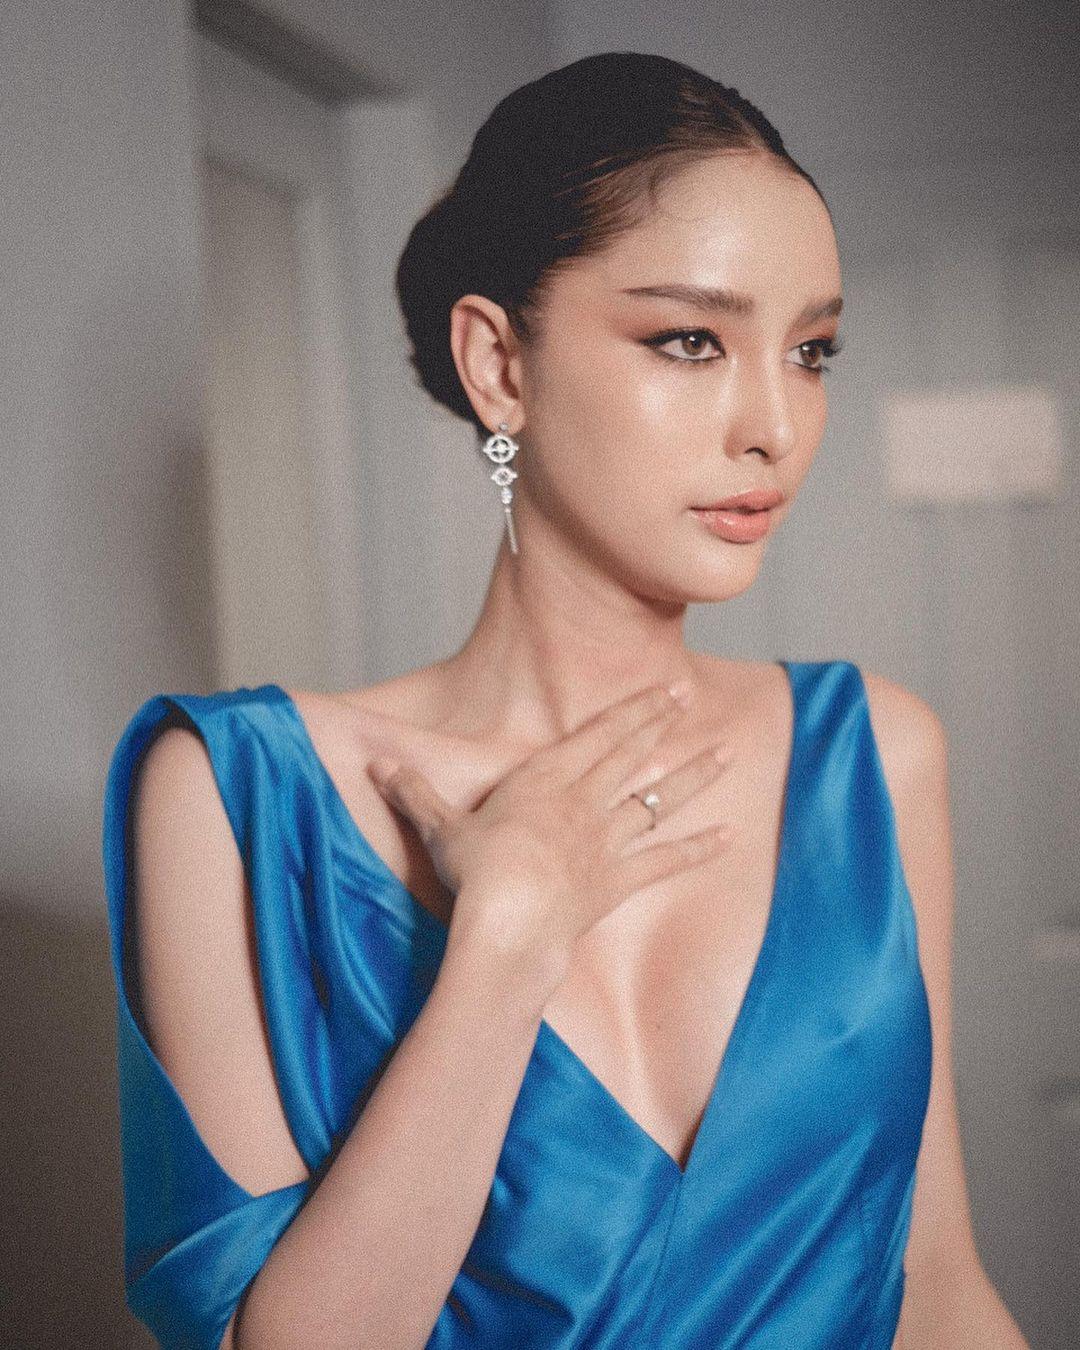 Nisamanee Nutt - Beautiful Thailand Transgender Fashion